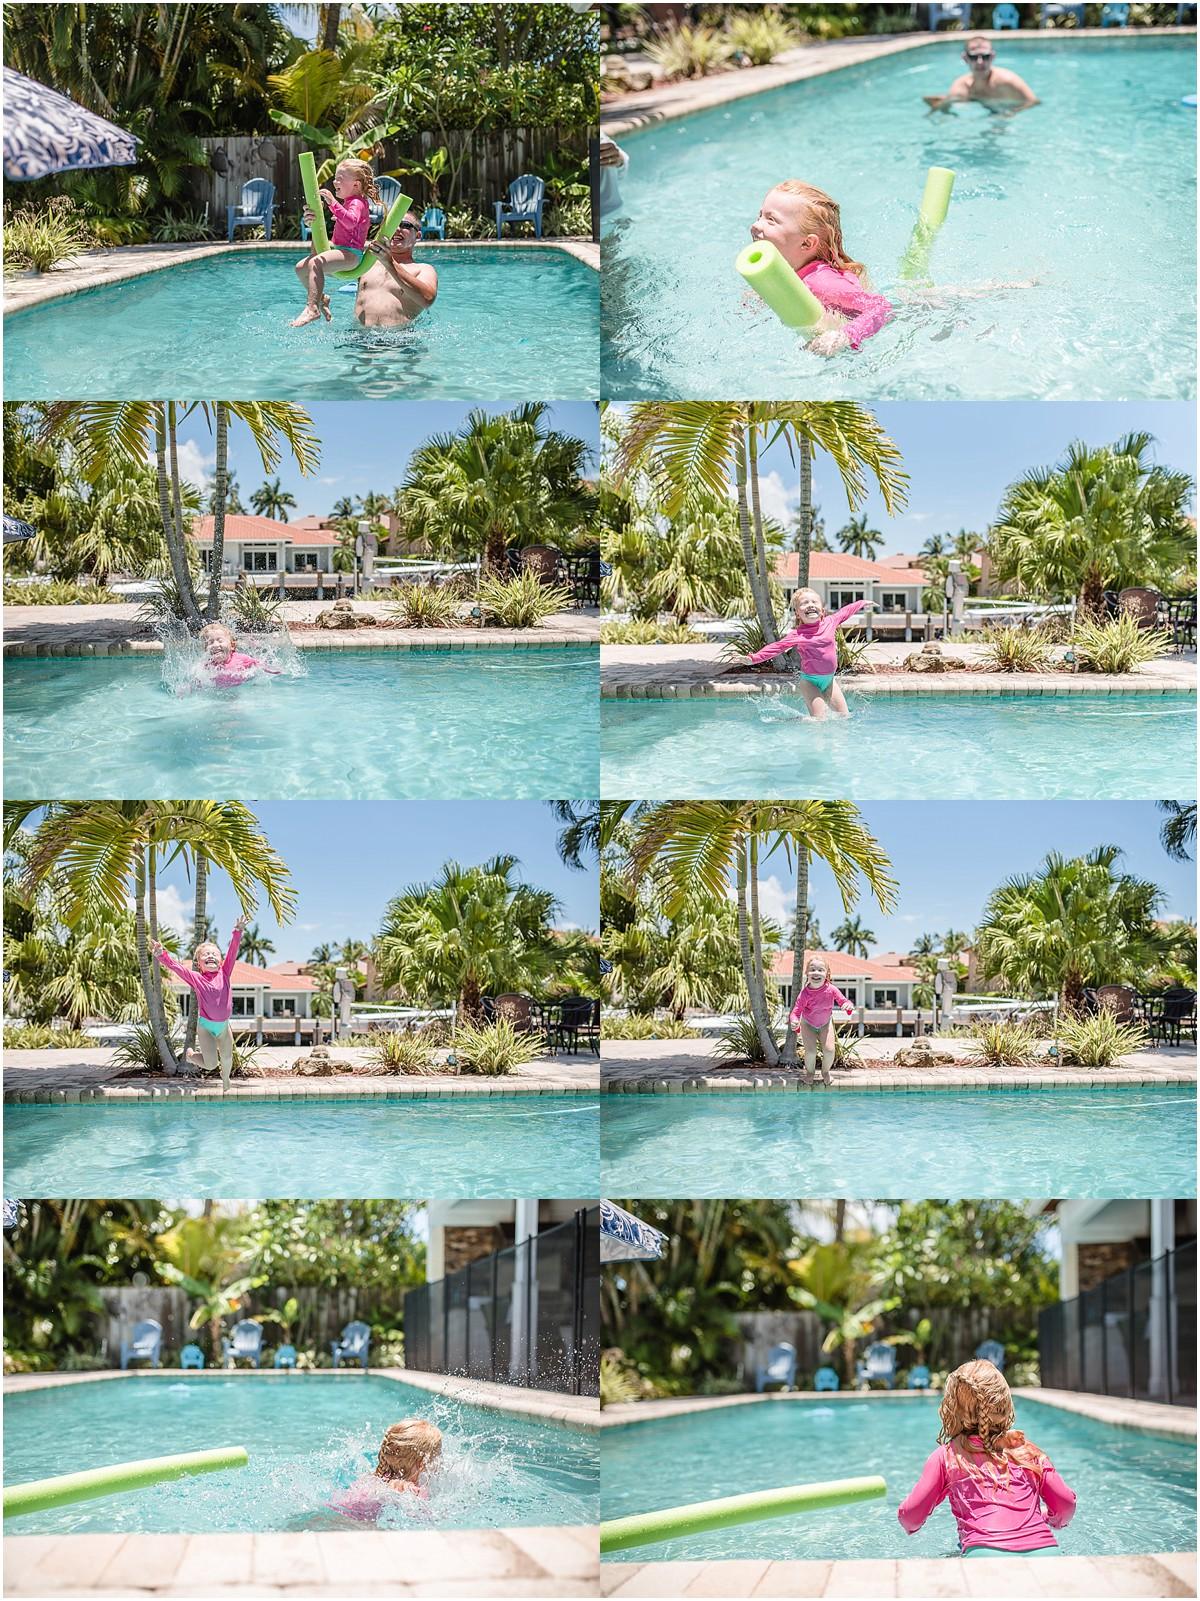 Ashley_Rogers_Photography_South_Florida_Photographer_Orlando_Photographer_Costa_Rica_Photographer_0792.jpg